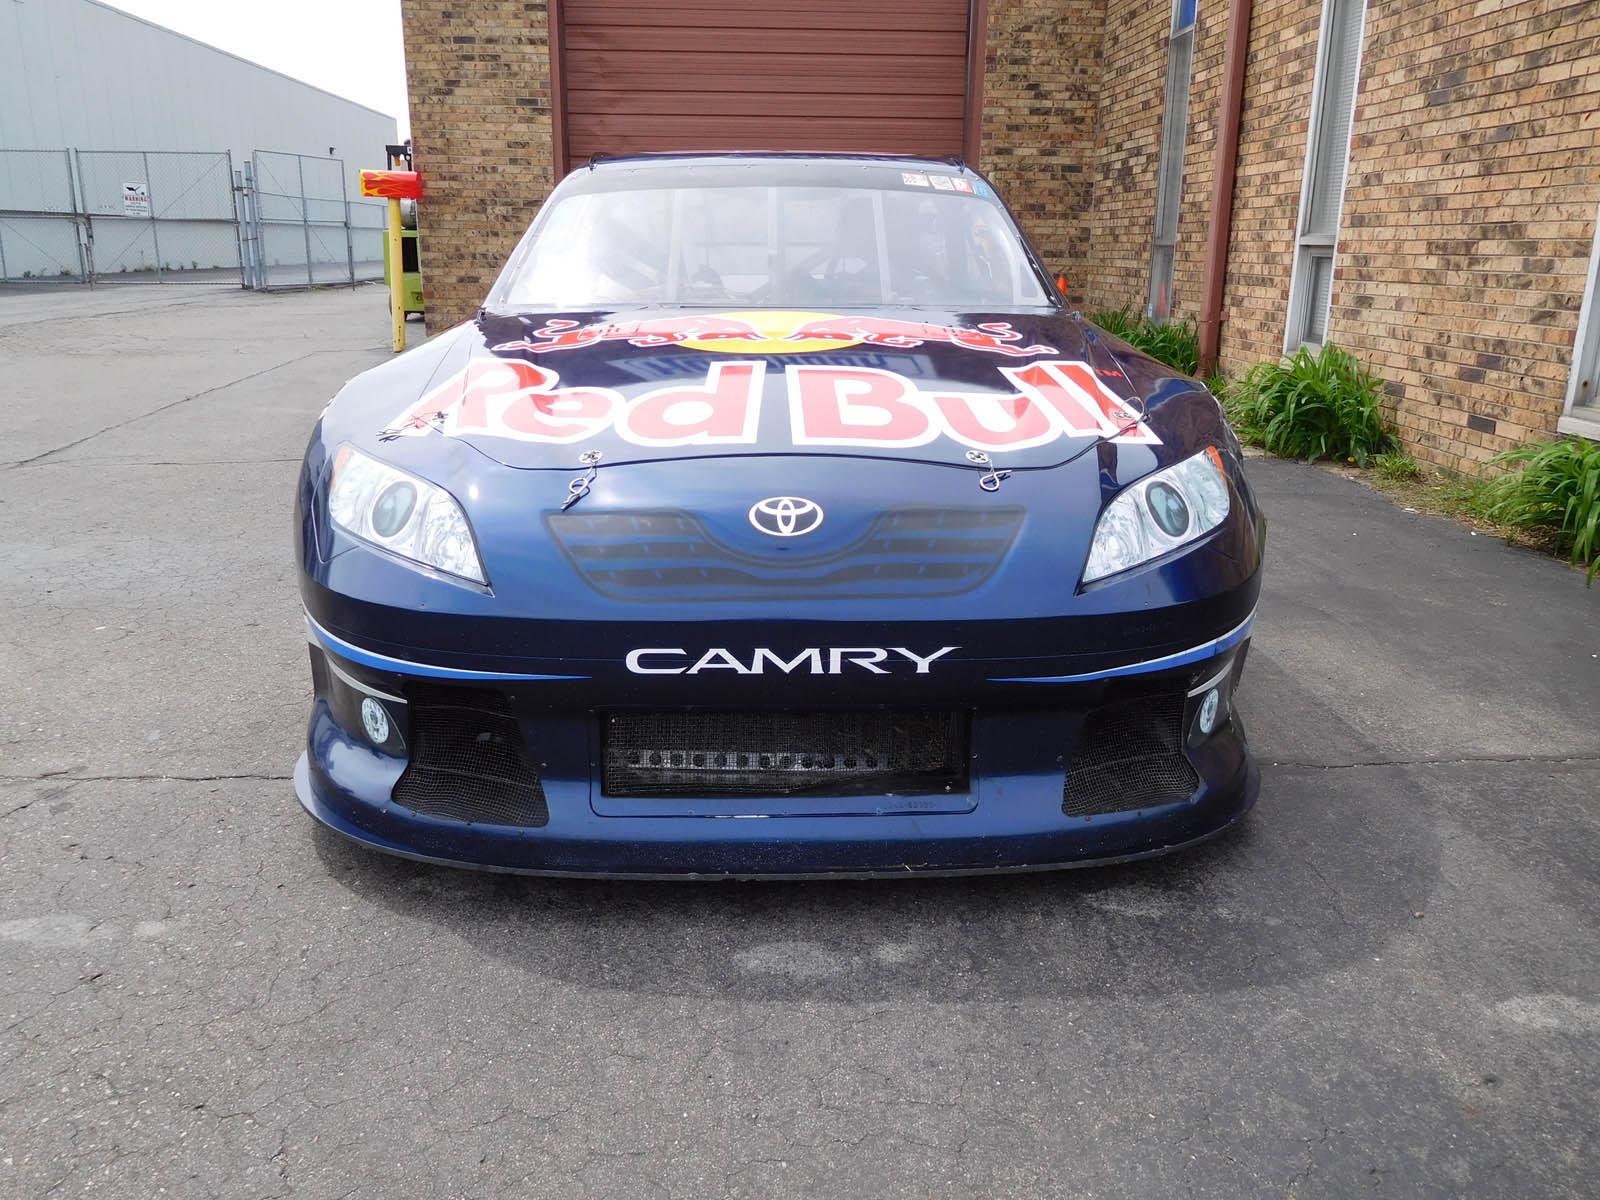 2008_Toyota_Camry_Nascar_19